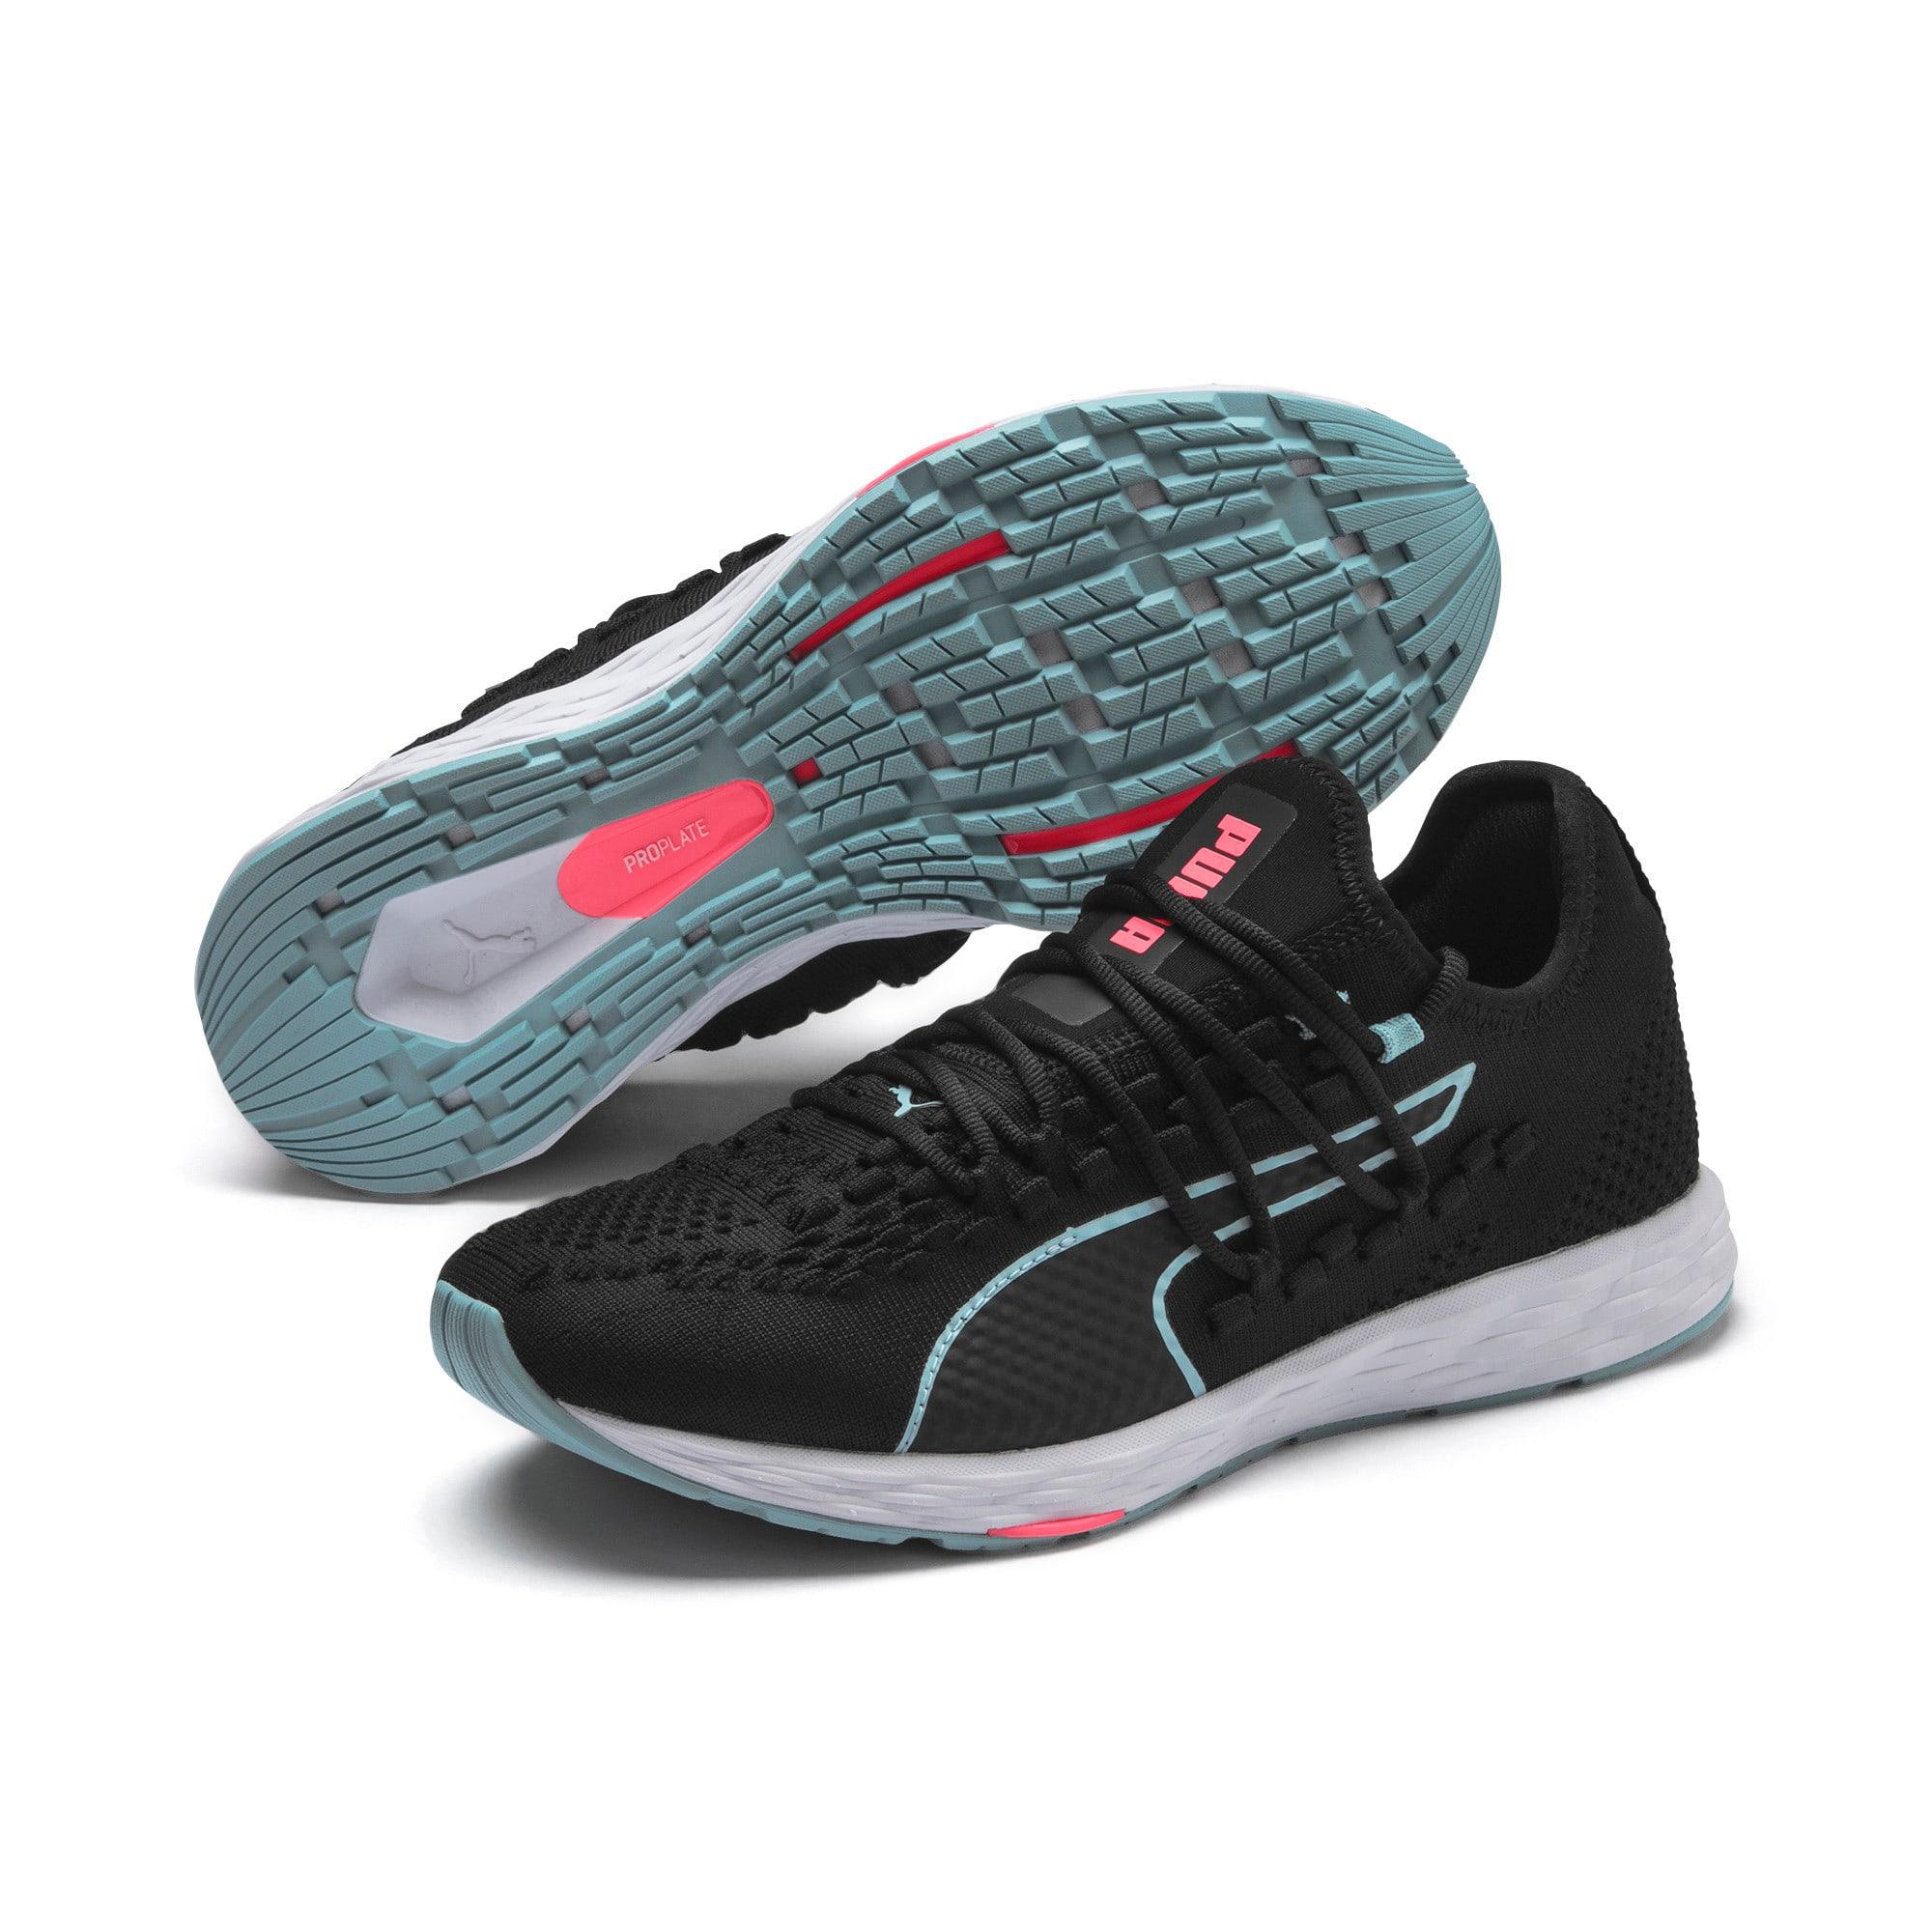 Thumbnail 3 of SPEED RACER Women's Running Shoes, Black-Milky Blue-Pink Alert, medium